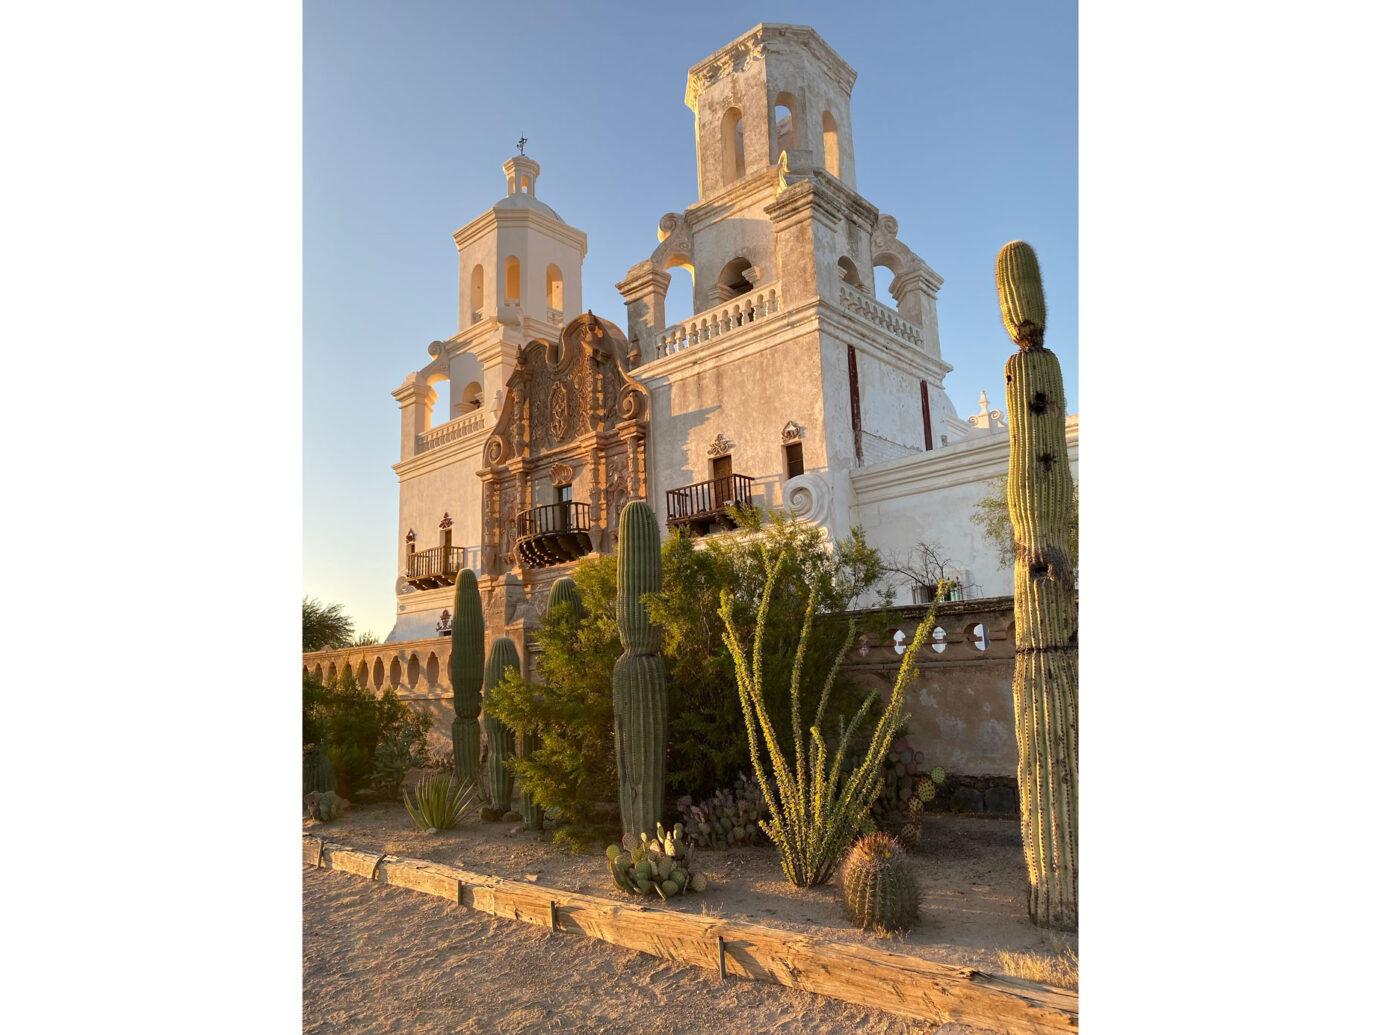 Mission San Xavier del Bac, Tucson AZ